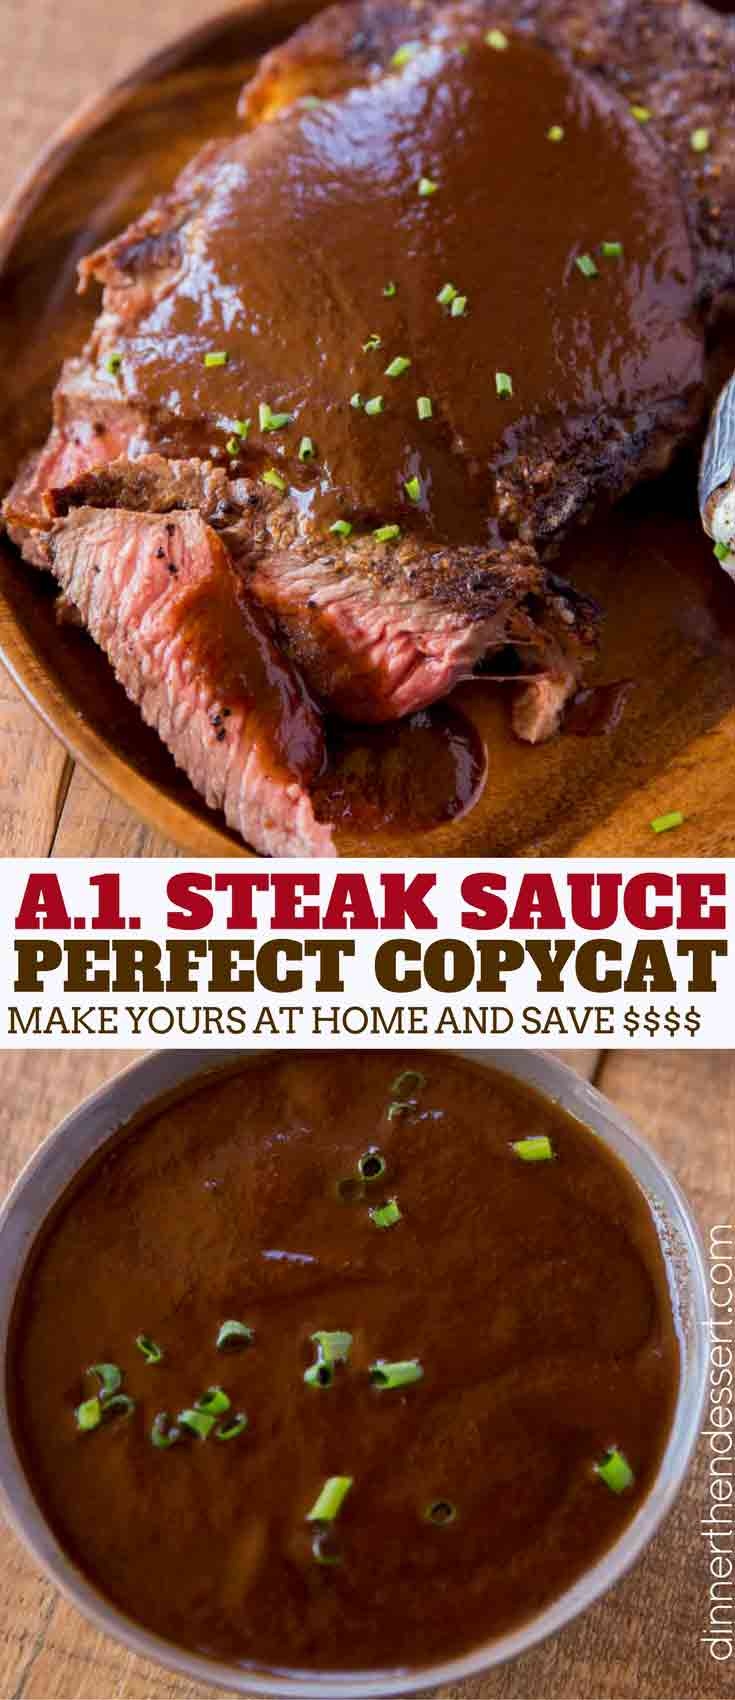 A1 Steak Sauce Carbs : steak, sauce, carbs, Steak, Sauce, (Copycat), Dinner,, Dessert